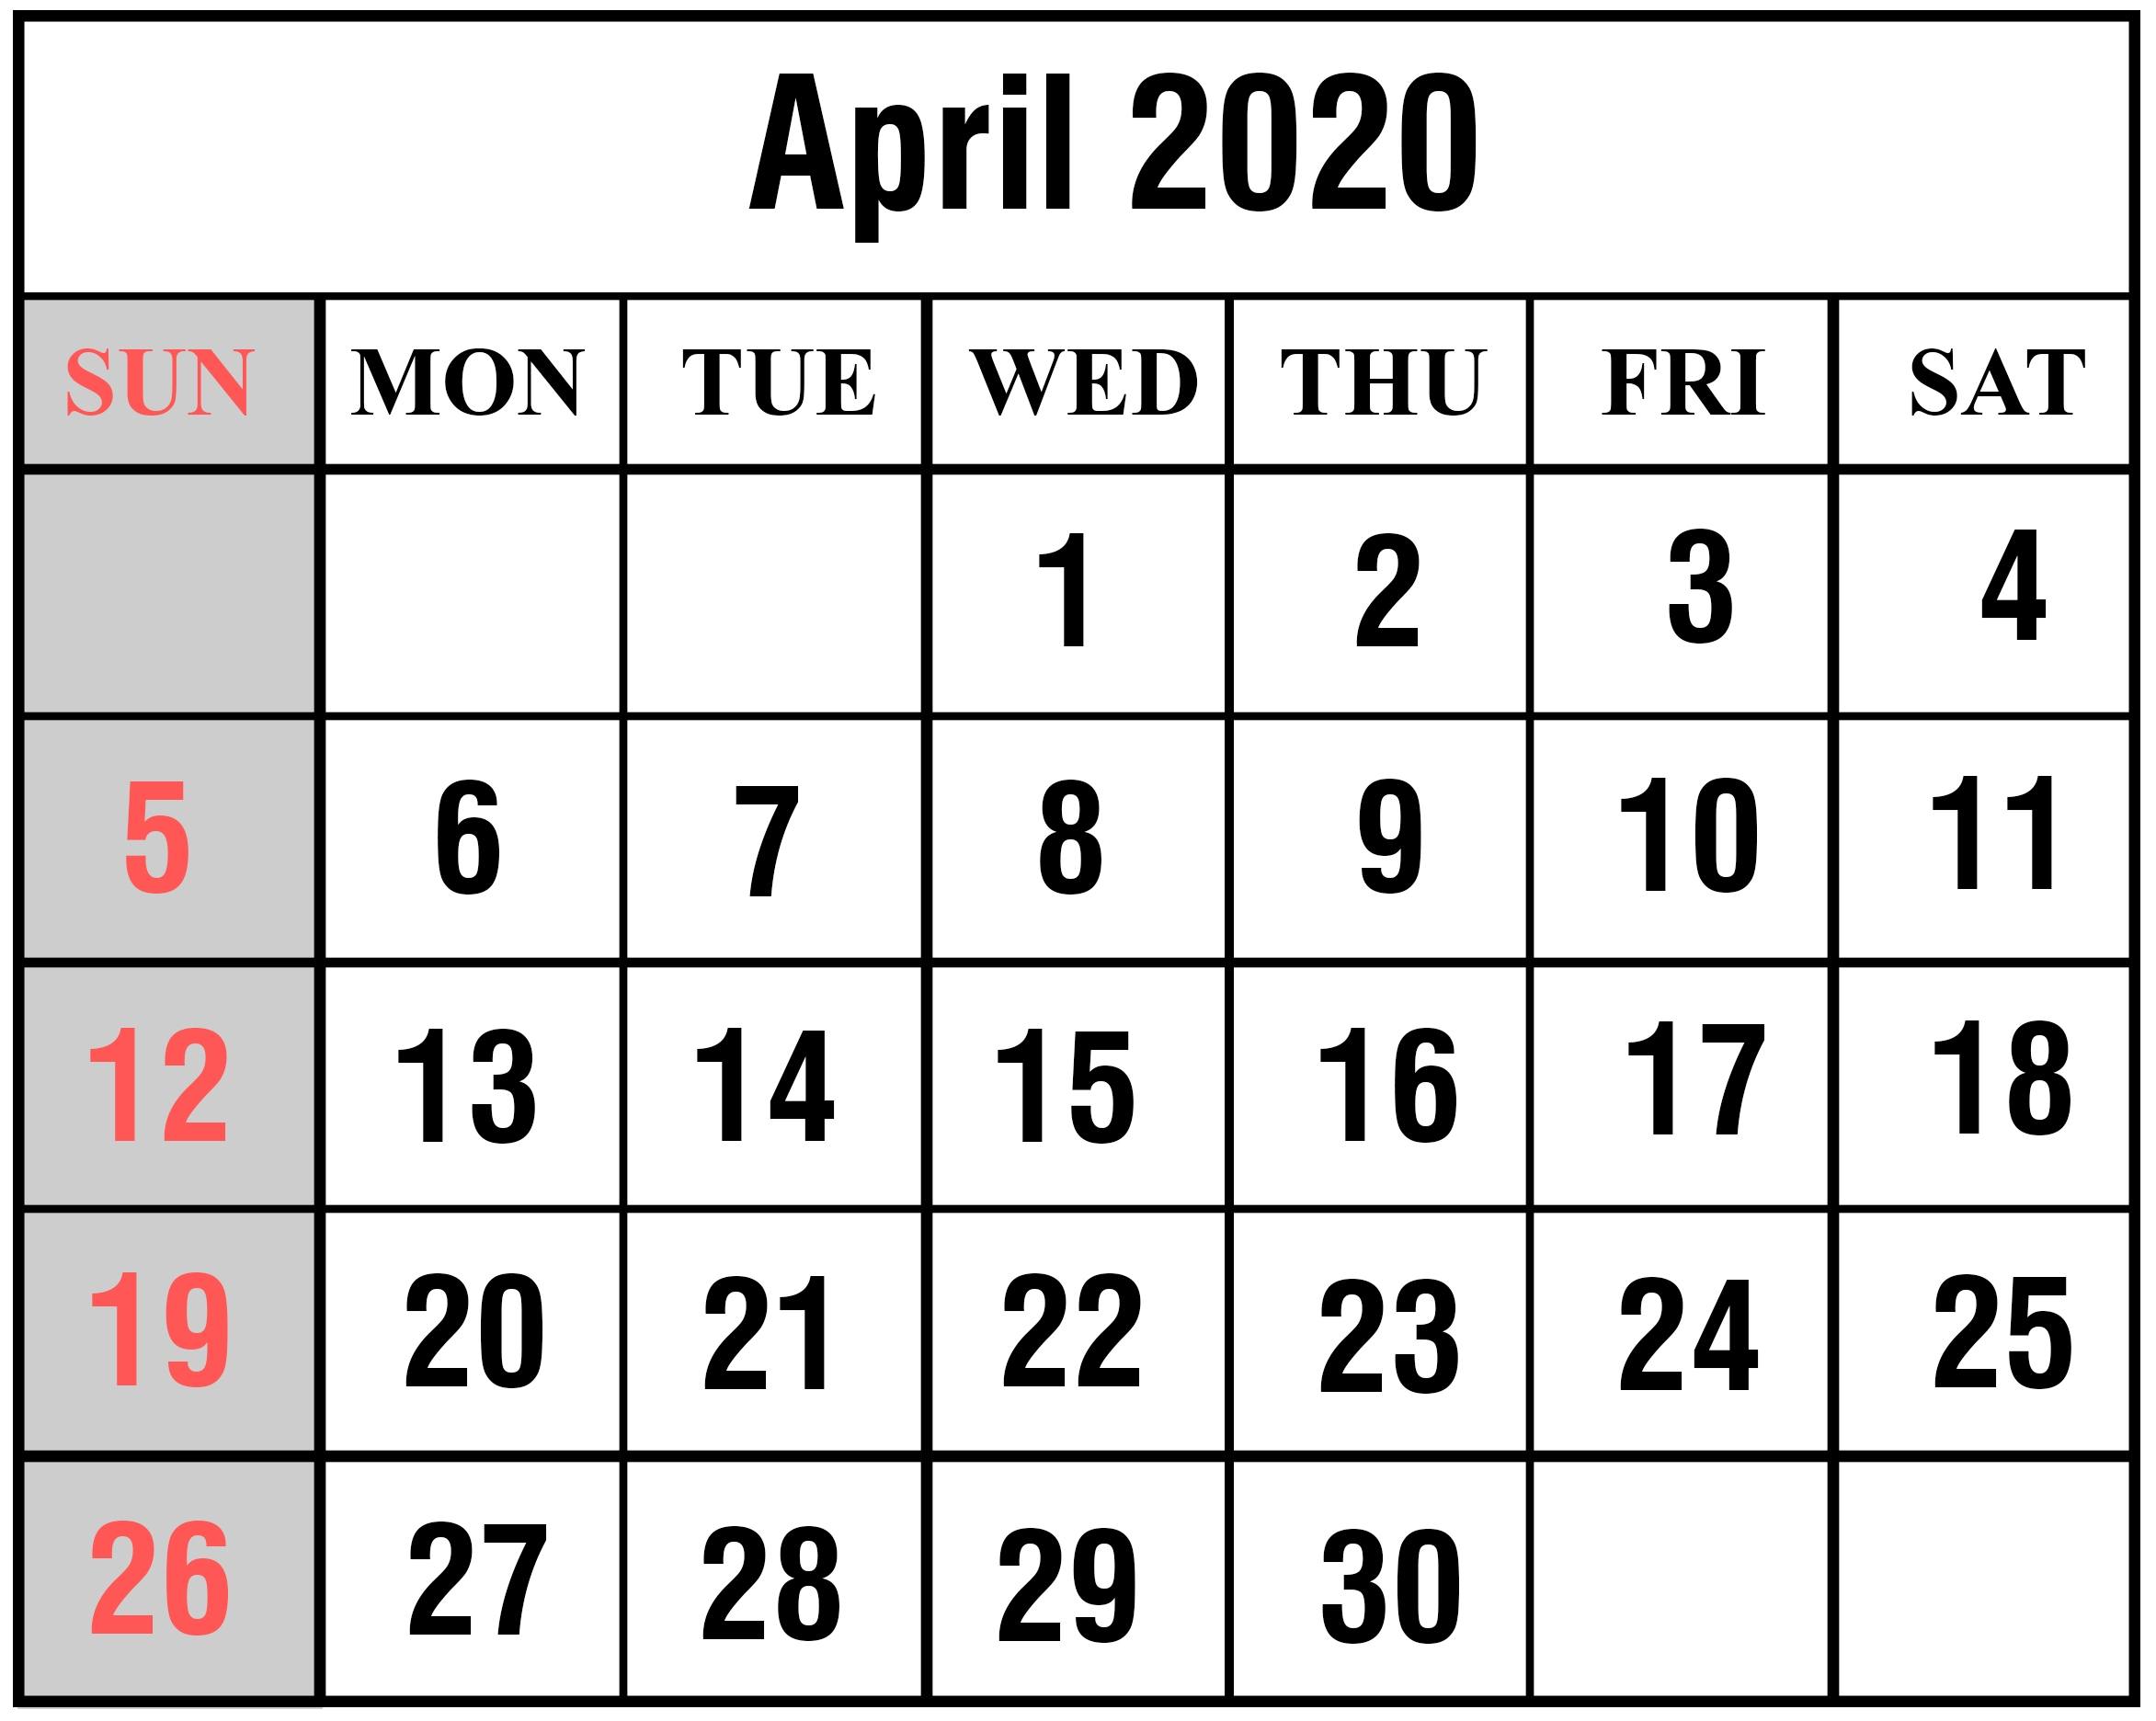 April 2020 May 2020 Calendar | Example Calendar Printable inside April 2020 Printable Calendar